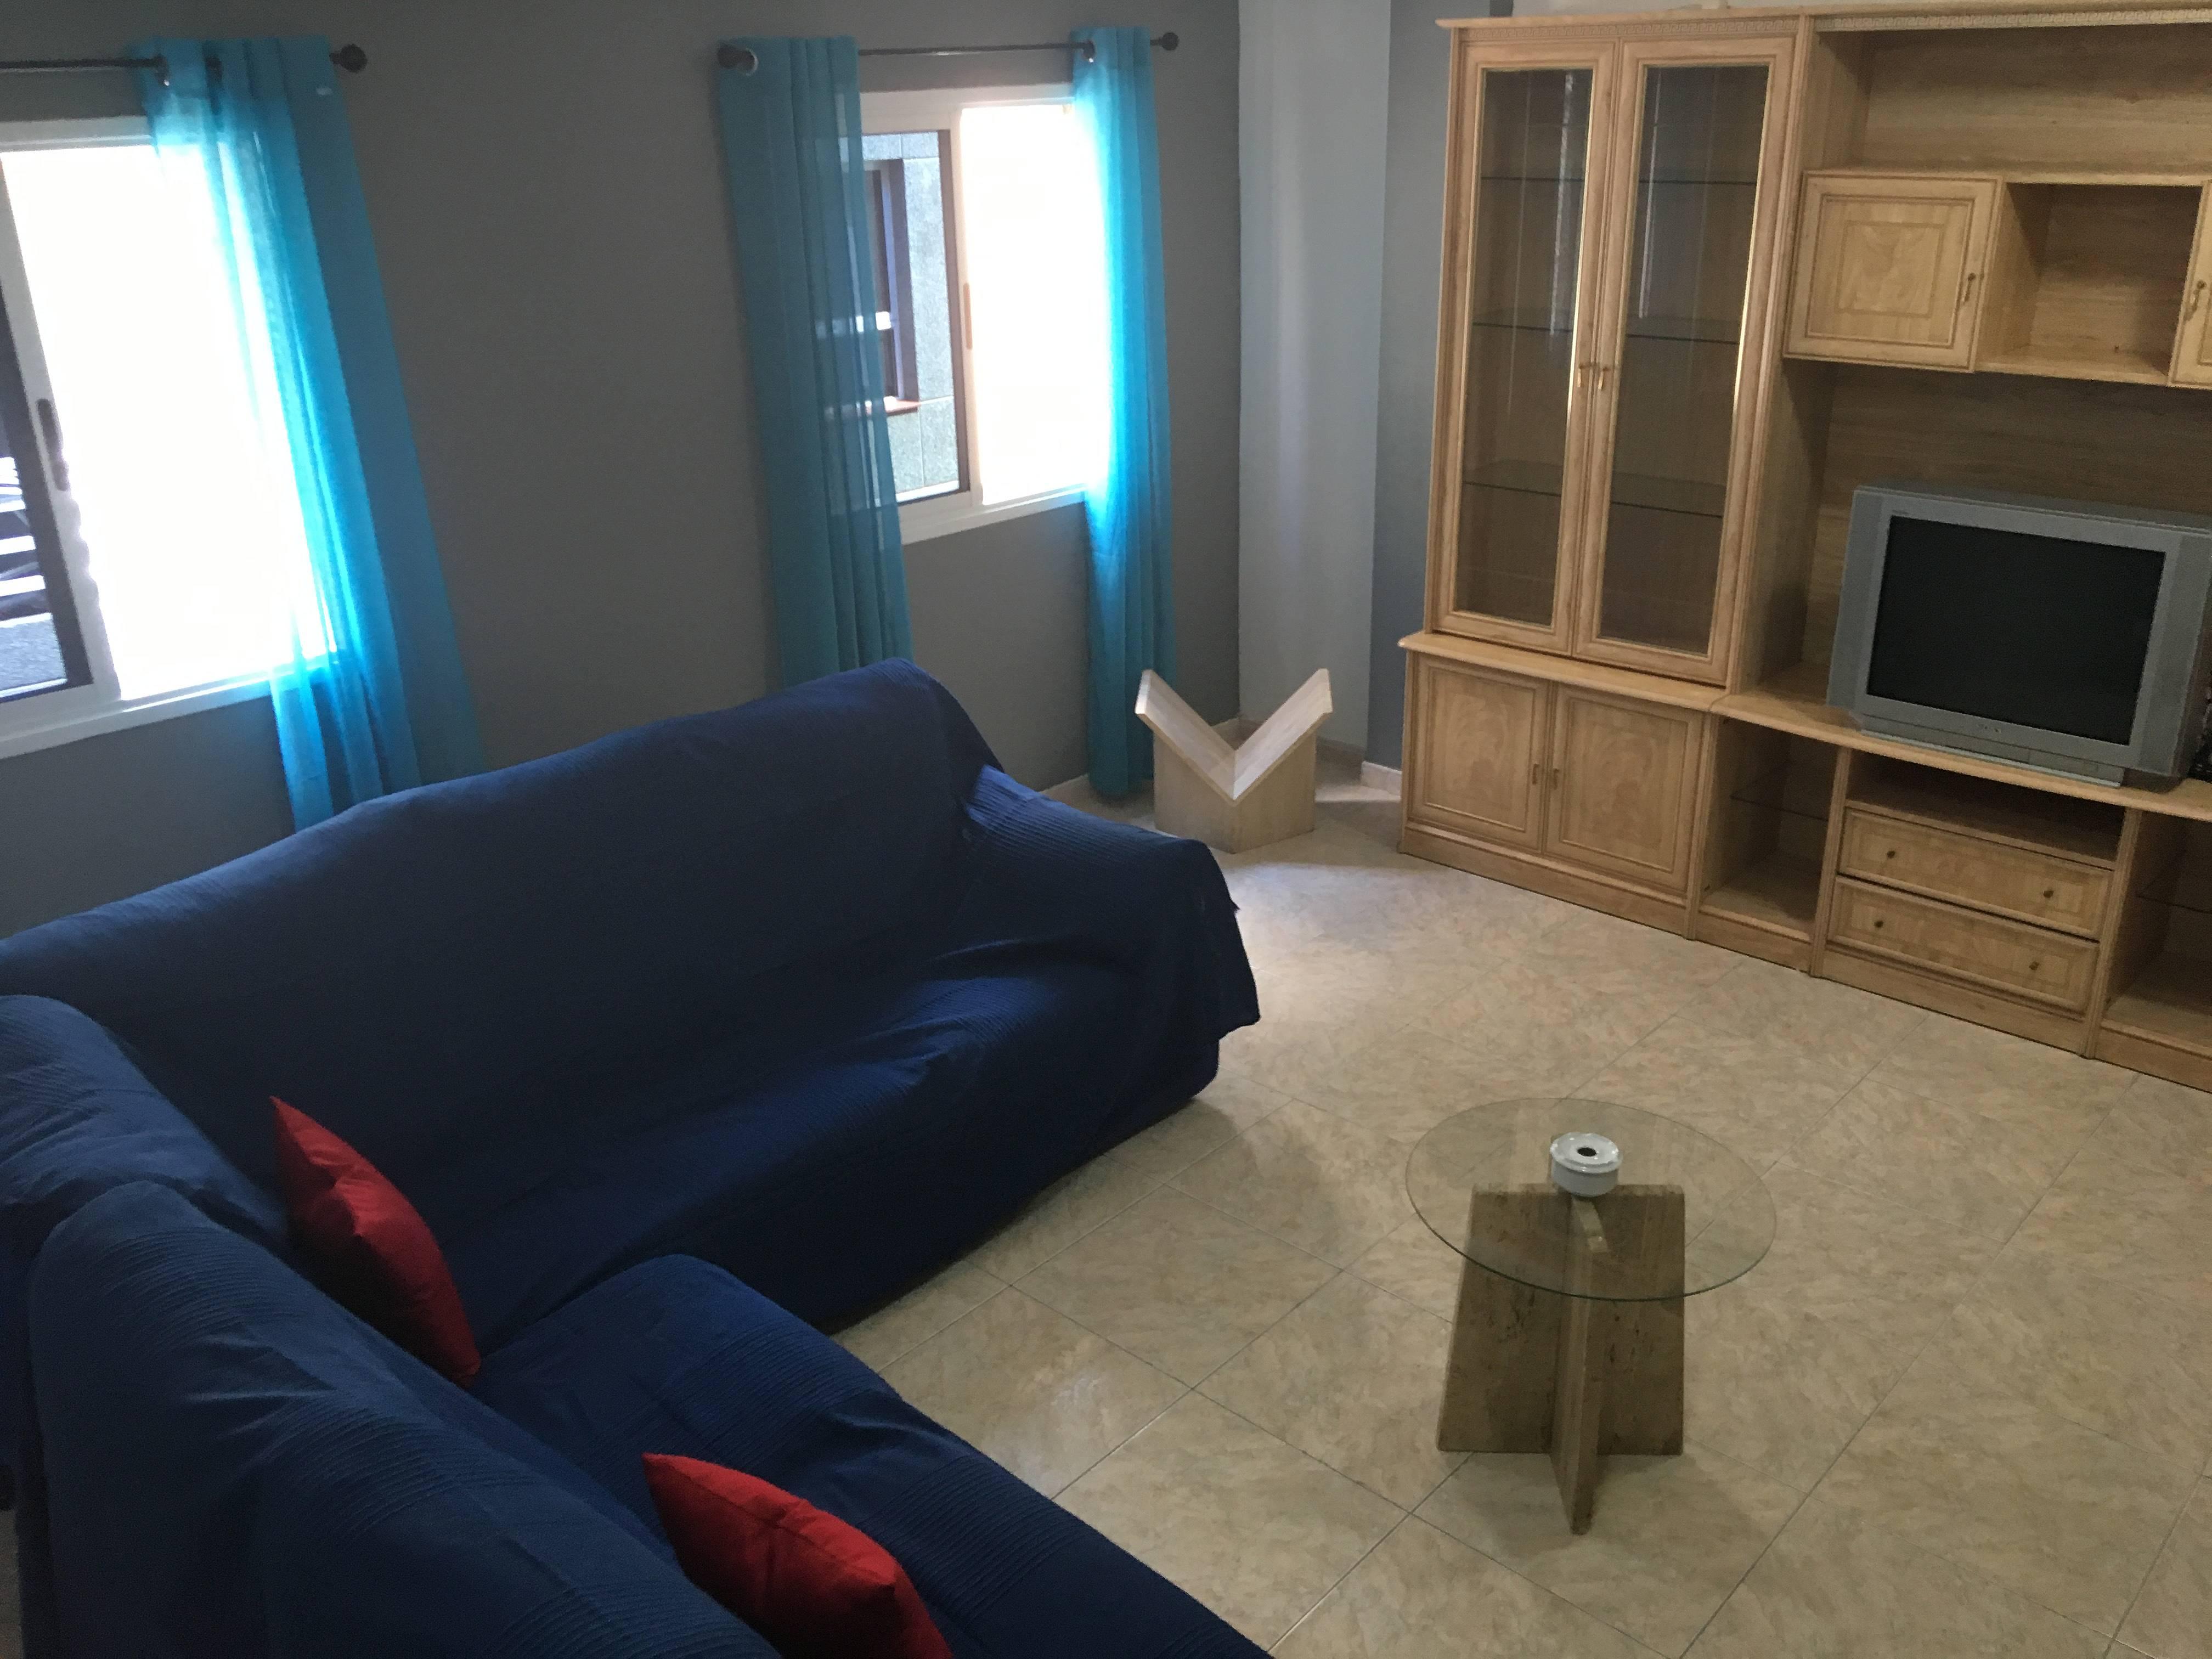 Apartamento para 4 personas en gran canaria vecindario santa luc a de tirajana gran canaria - Apartamento en gran canaria ...